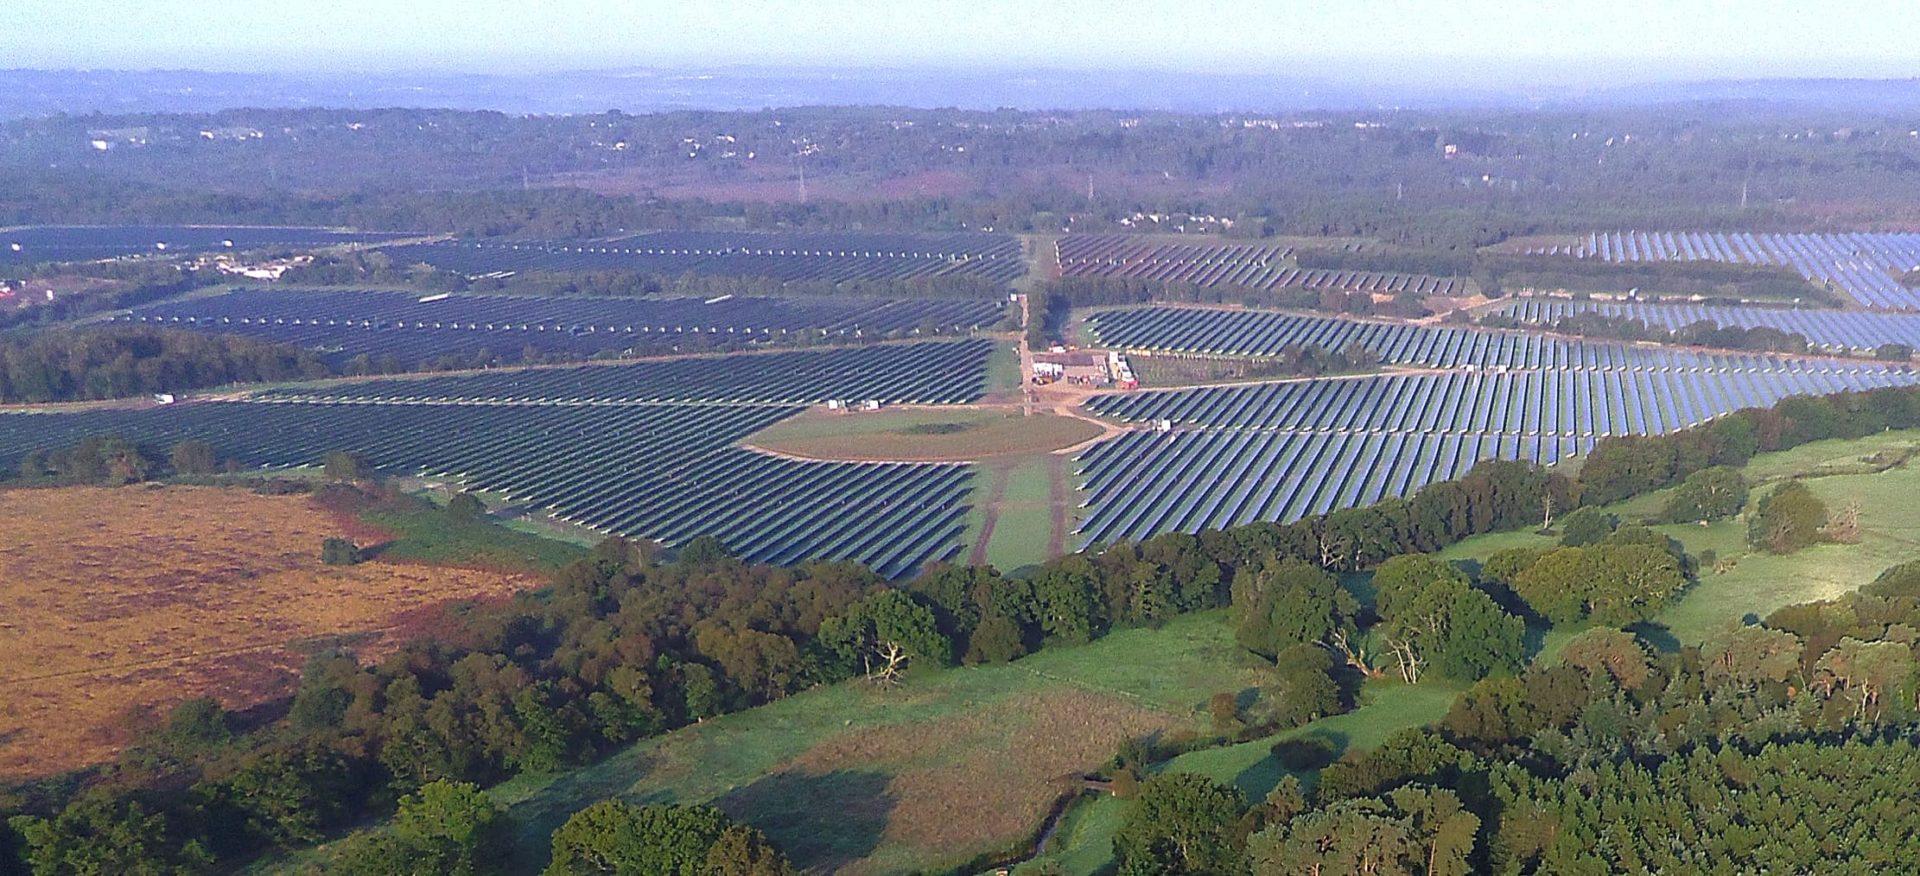 bournemouth_goldbeck-solar_1